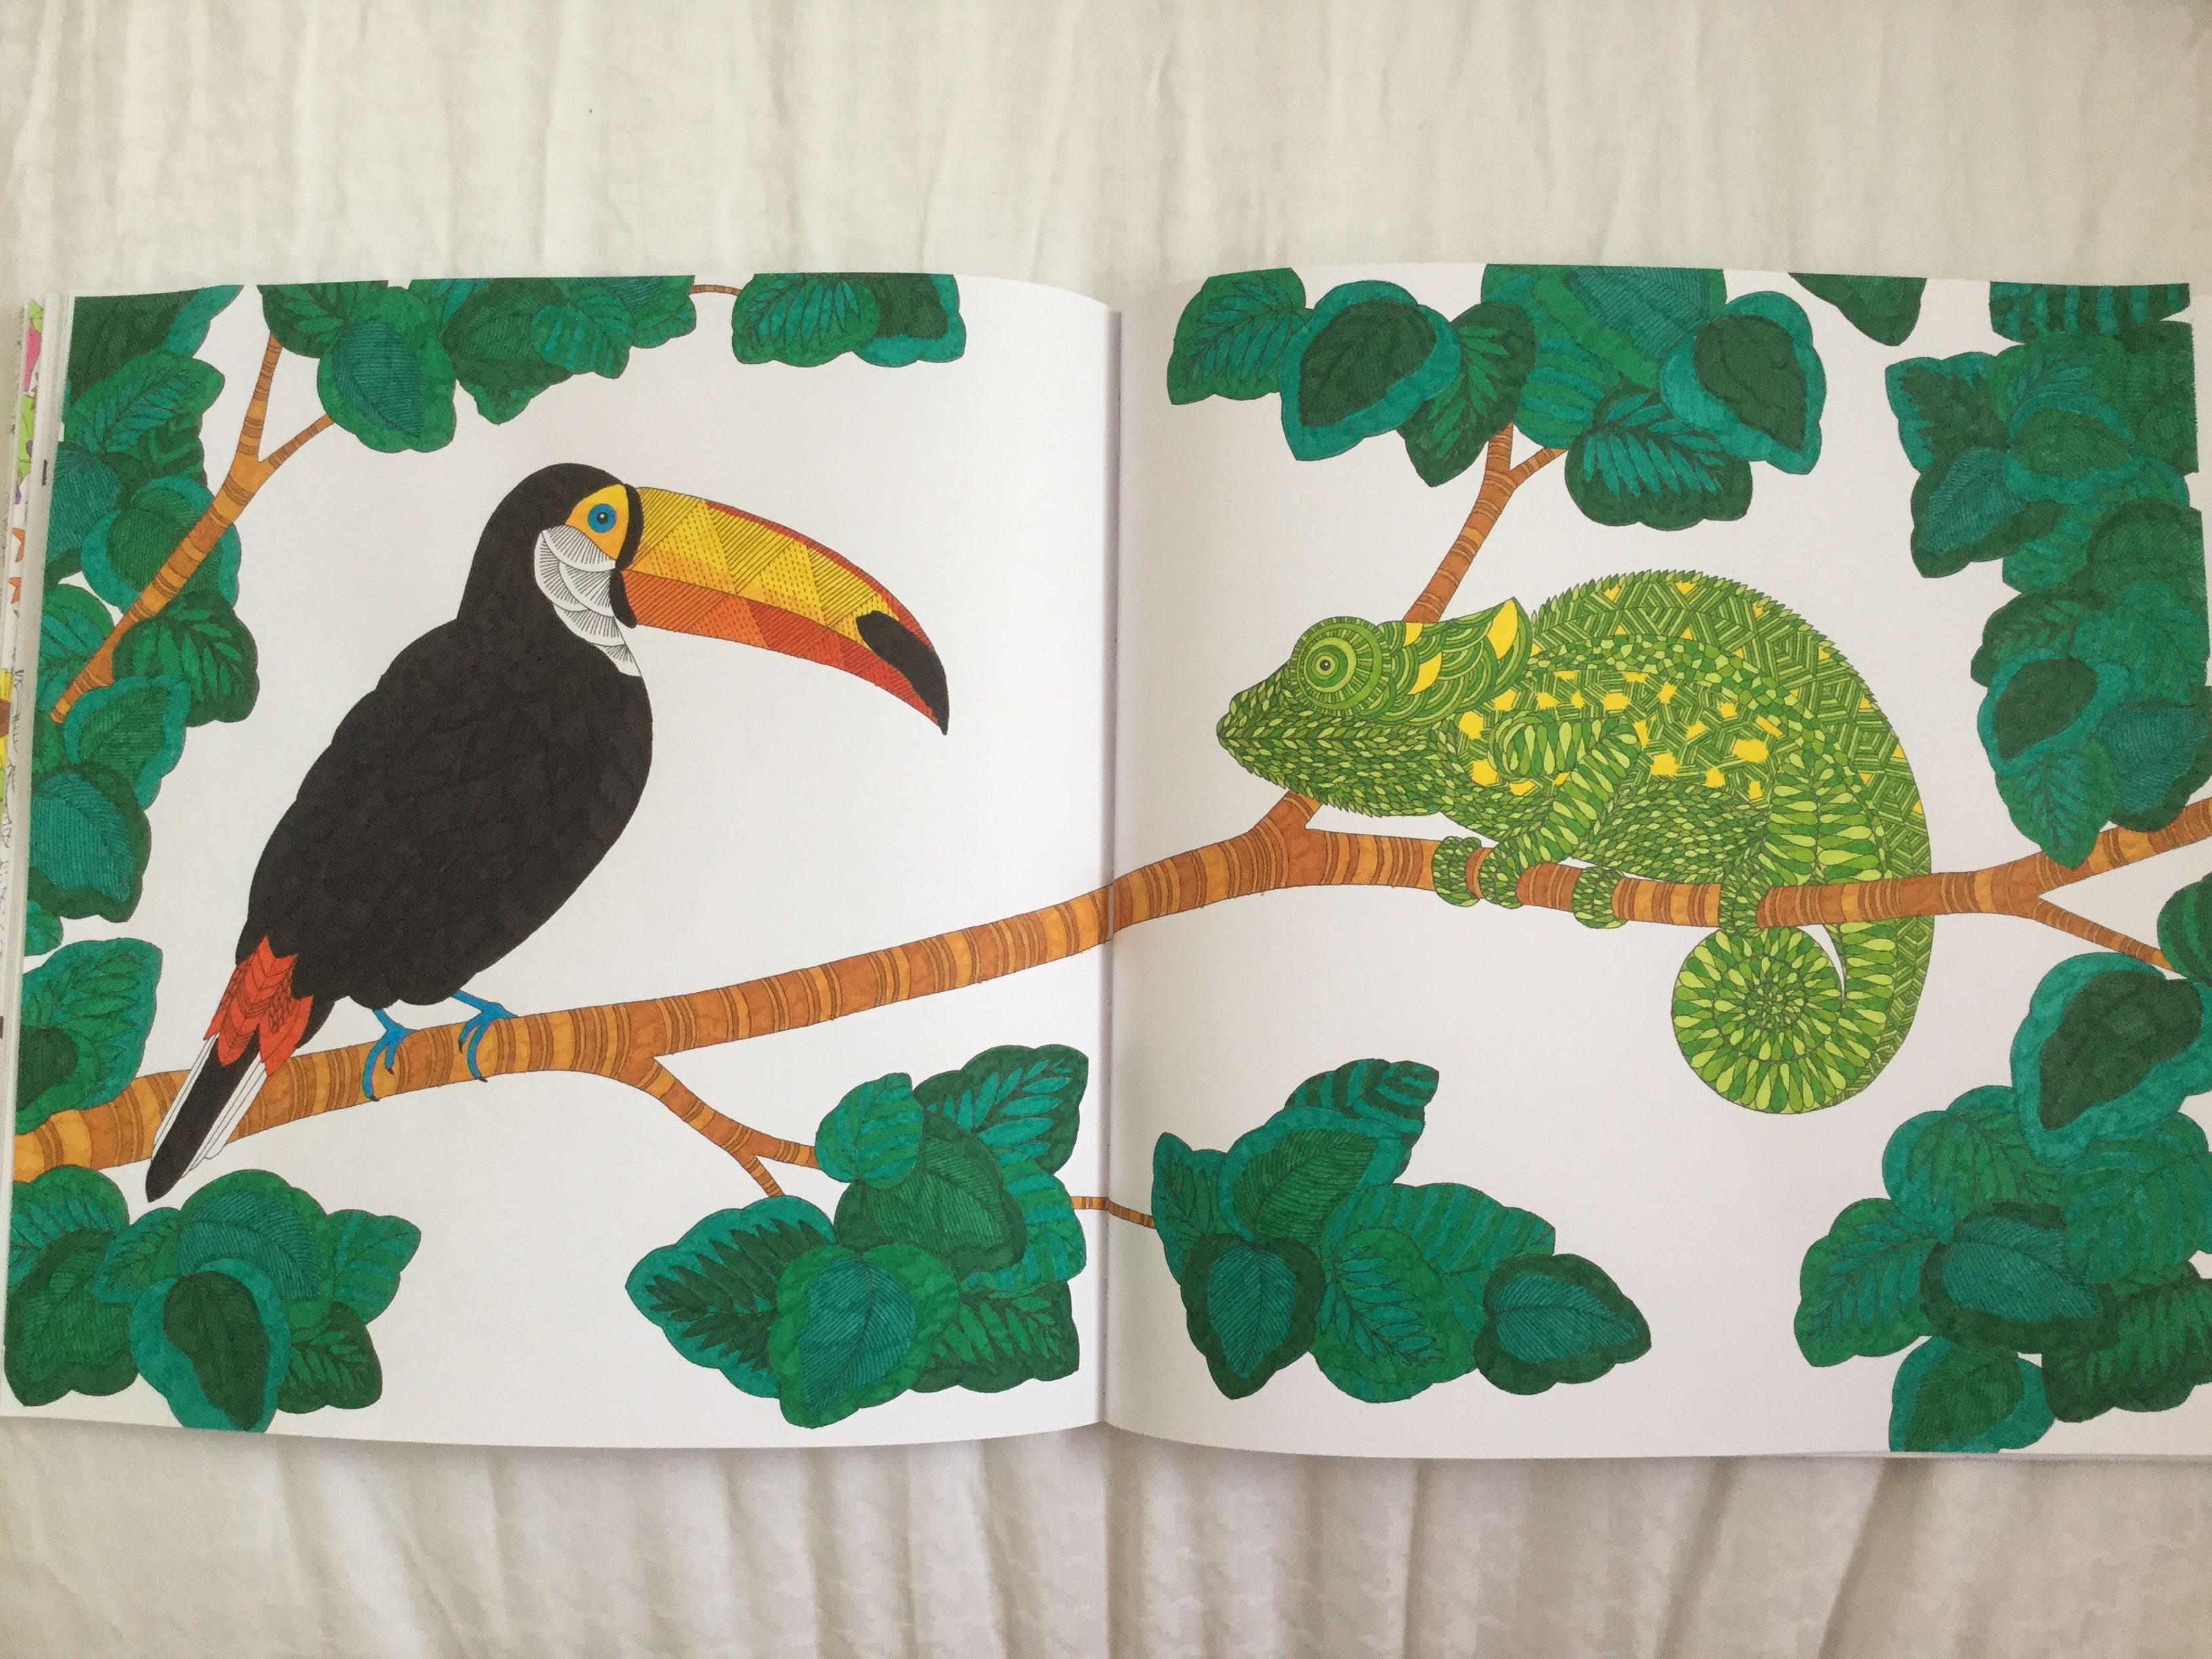 Toucan and Chameleon Animal Kingdom Book, Millie Marotta Animal Kingdom JB Pinterest